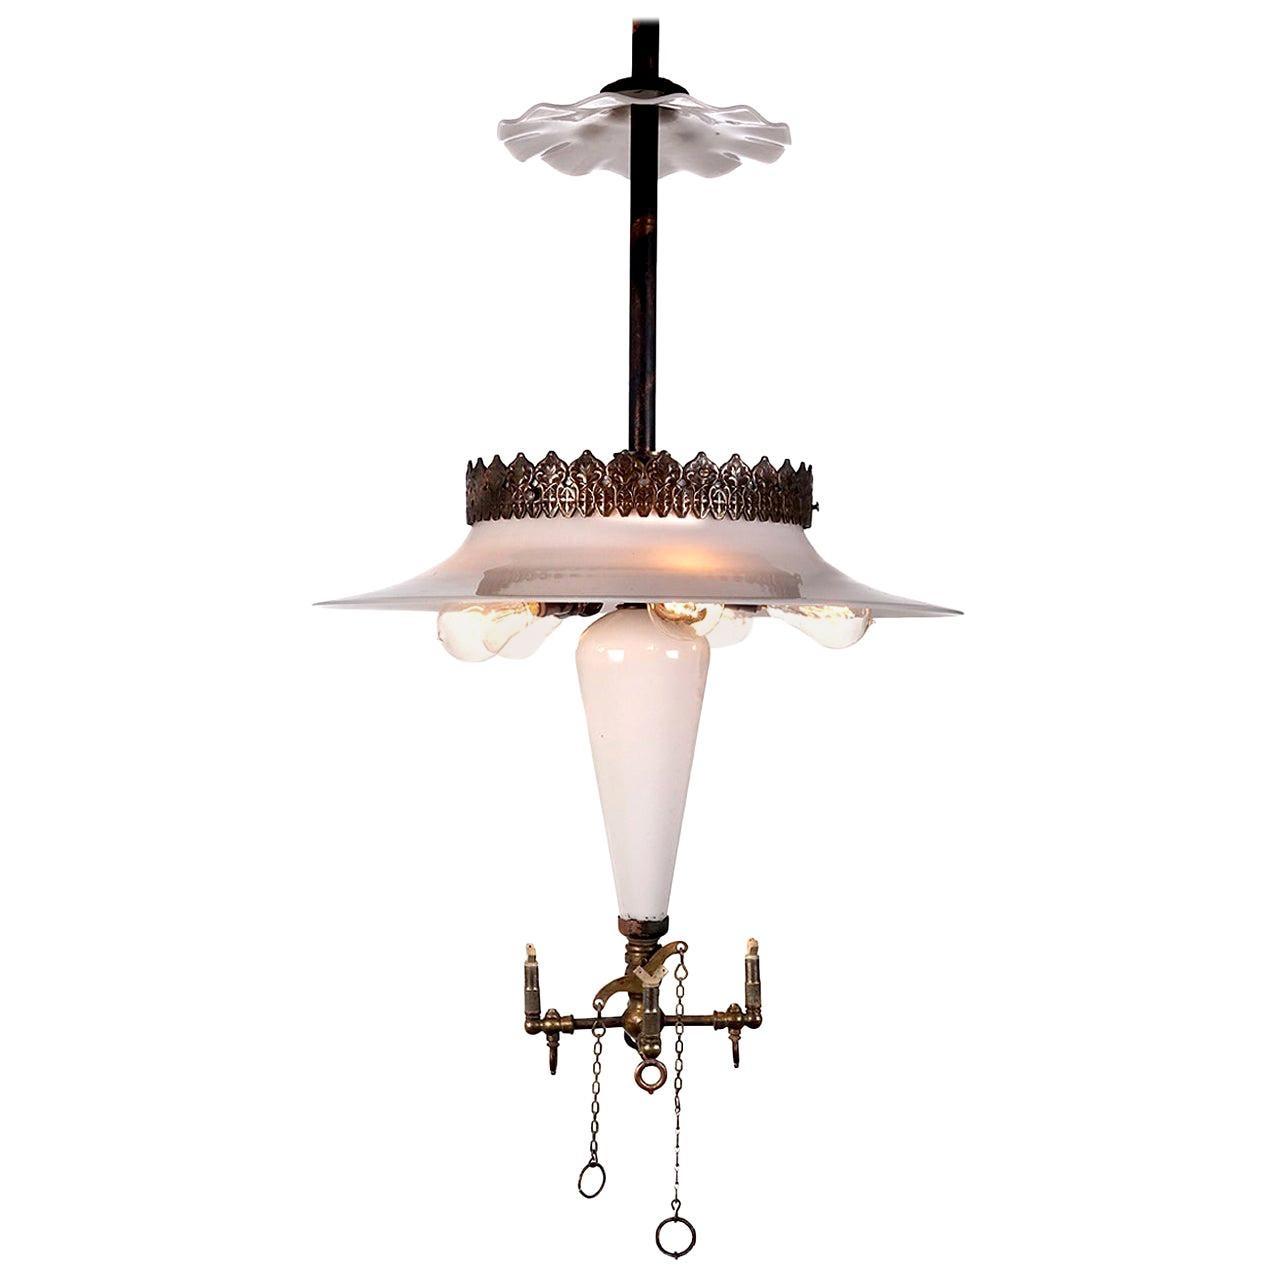 Rare Klemm Opal Cluster Reflector Lamp and Smoke Shield